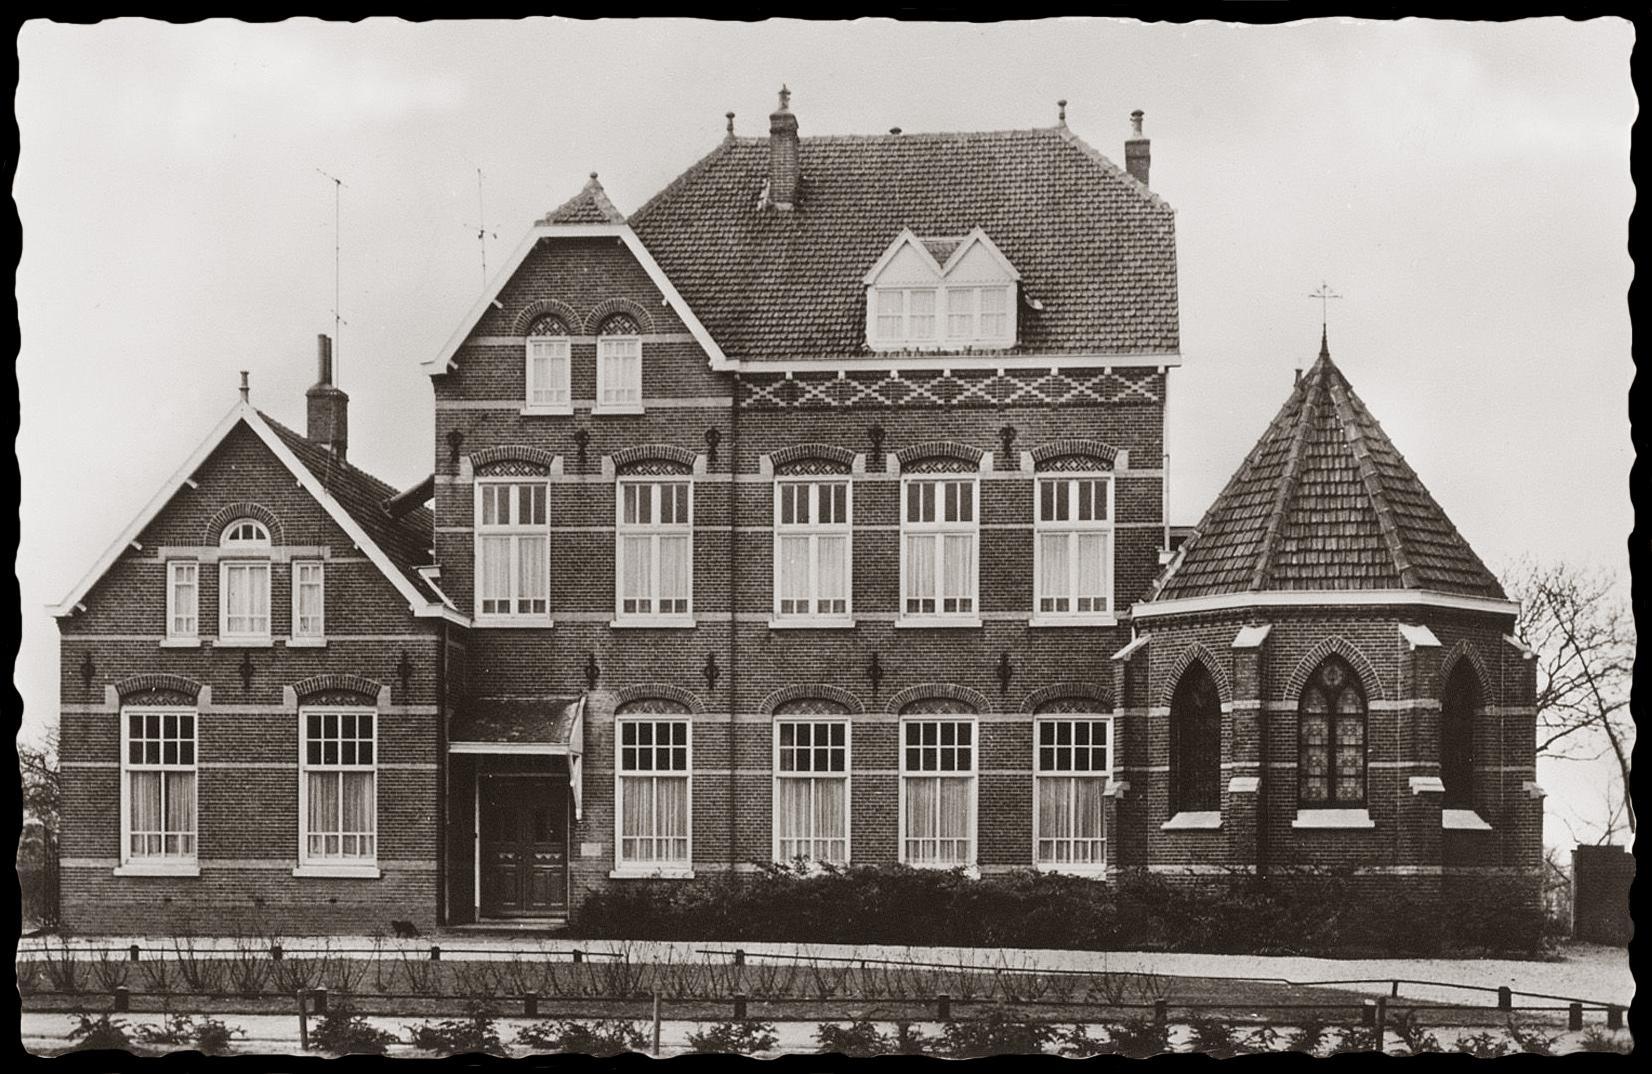 Bestand:Kaatsheuvel, Erasstraat 5 - .OA03.jpg - Reliwiki